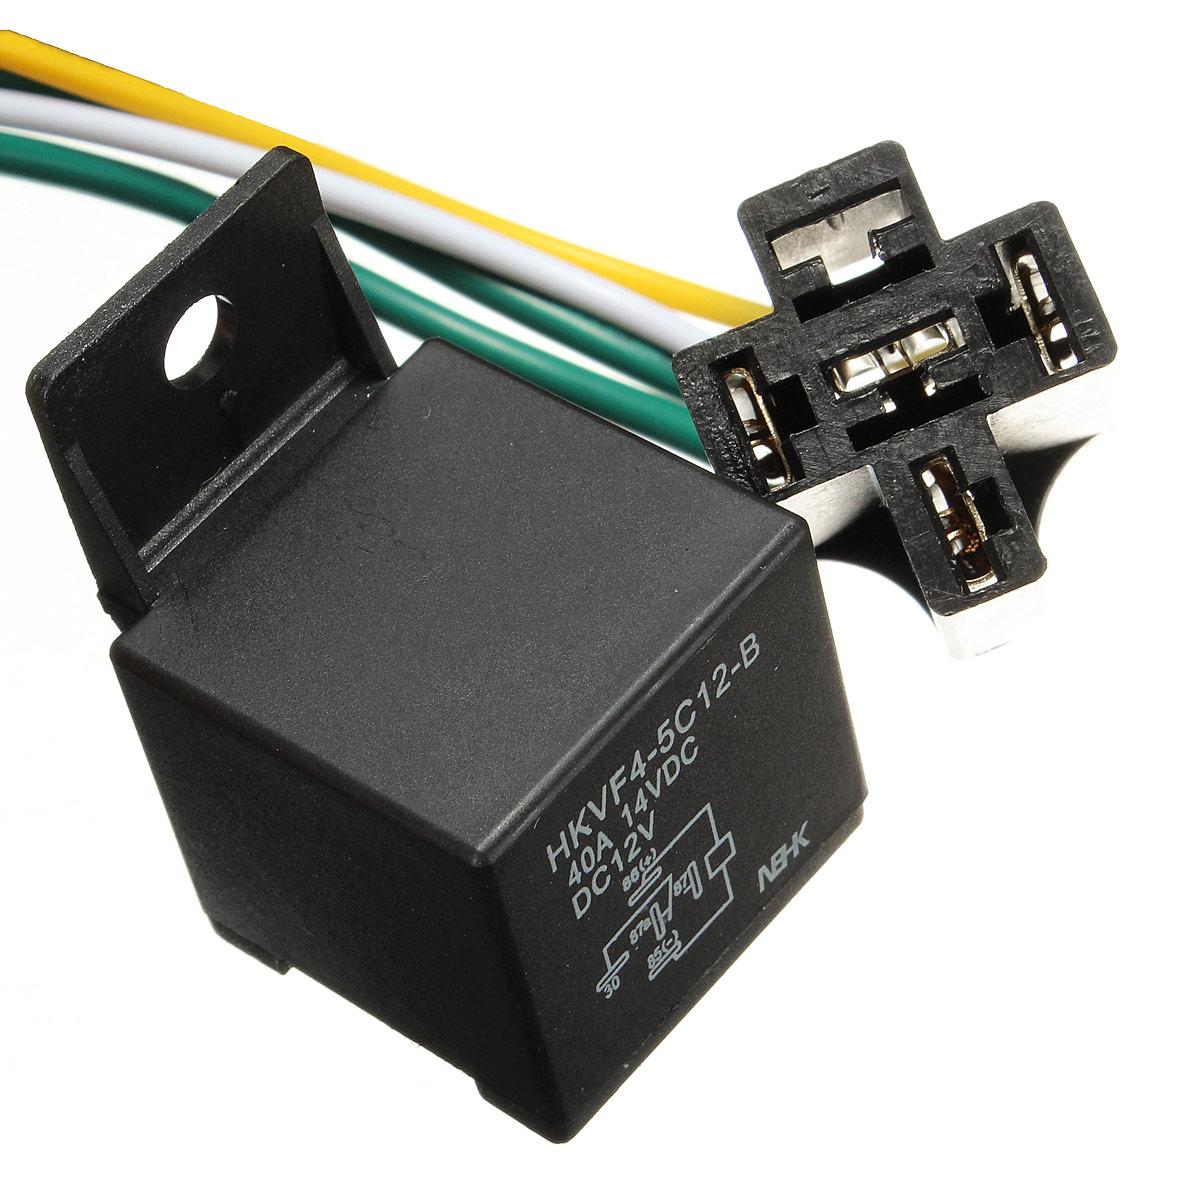 30 amp automotive relay socket 7 Round Trailer Wiring Diagram Ford 7-Way Trailer Wiring Diagram 7-Way Trailer Brake Wiring